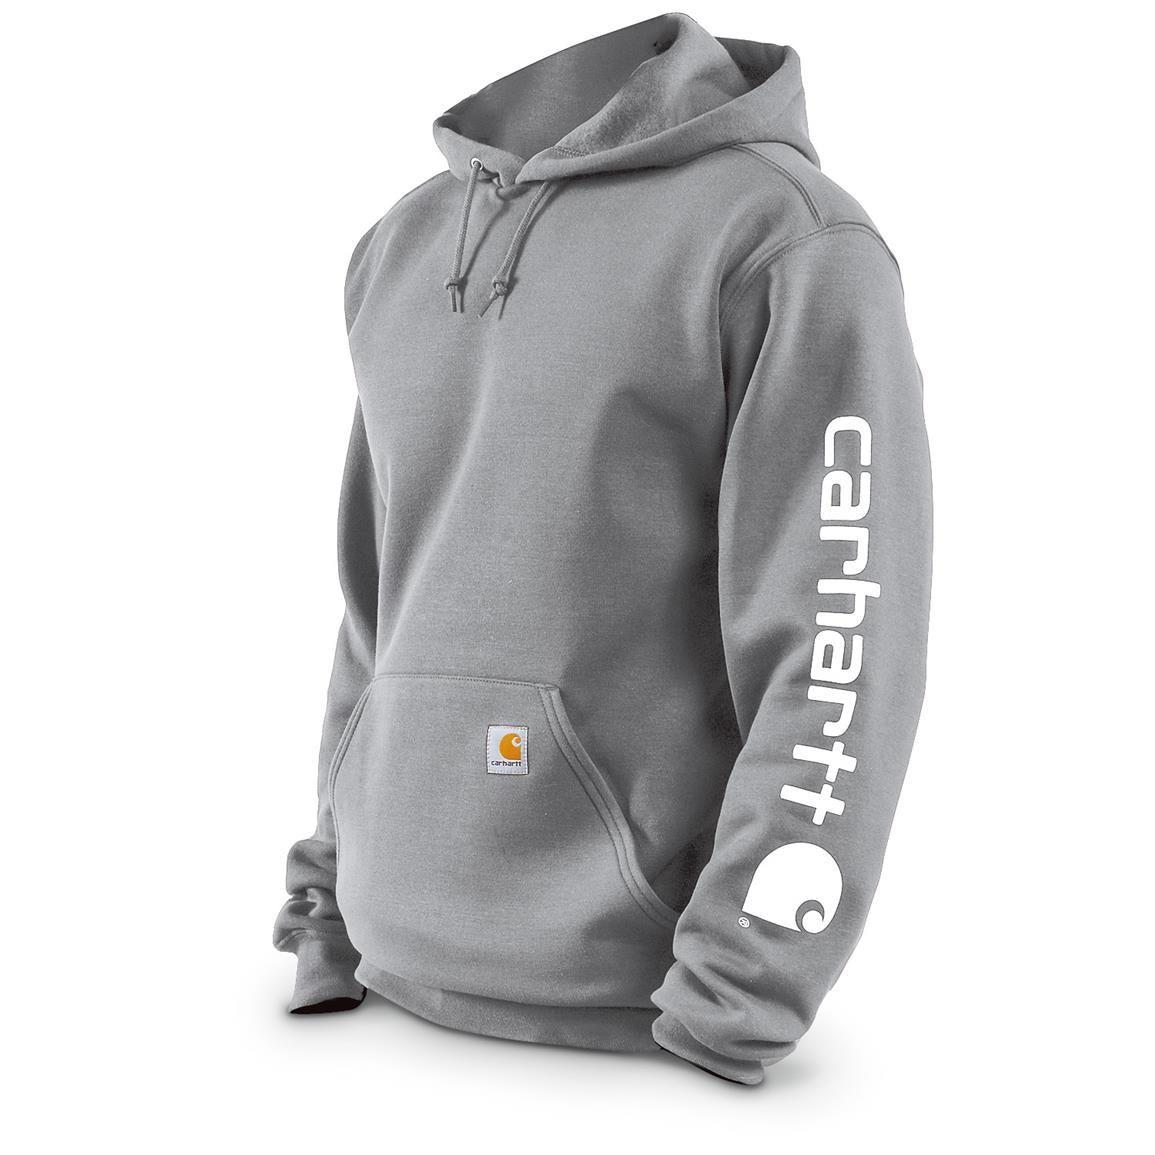 c5a27b2863 Carhartt Men s Midweight Hooded Sleeve Logo Sweatshirt